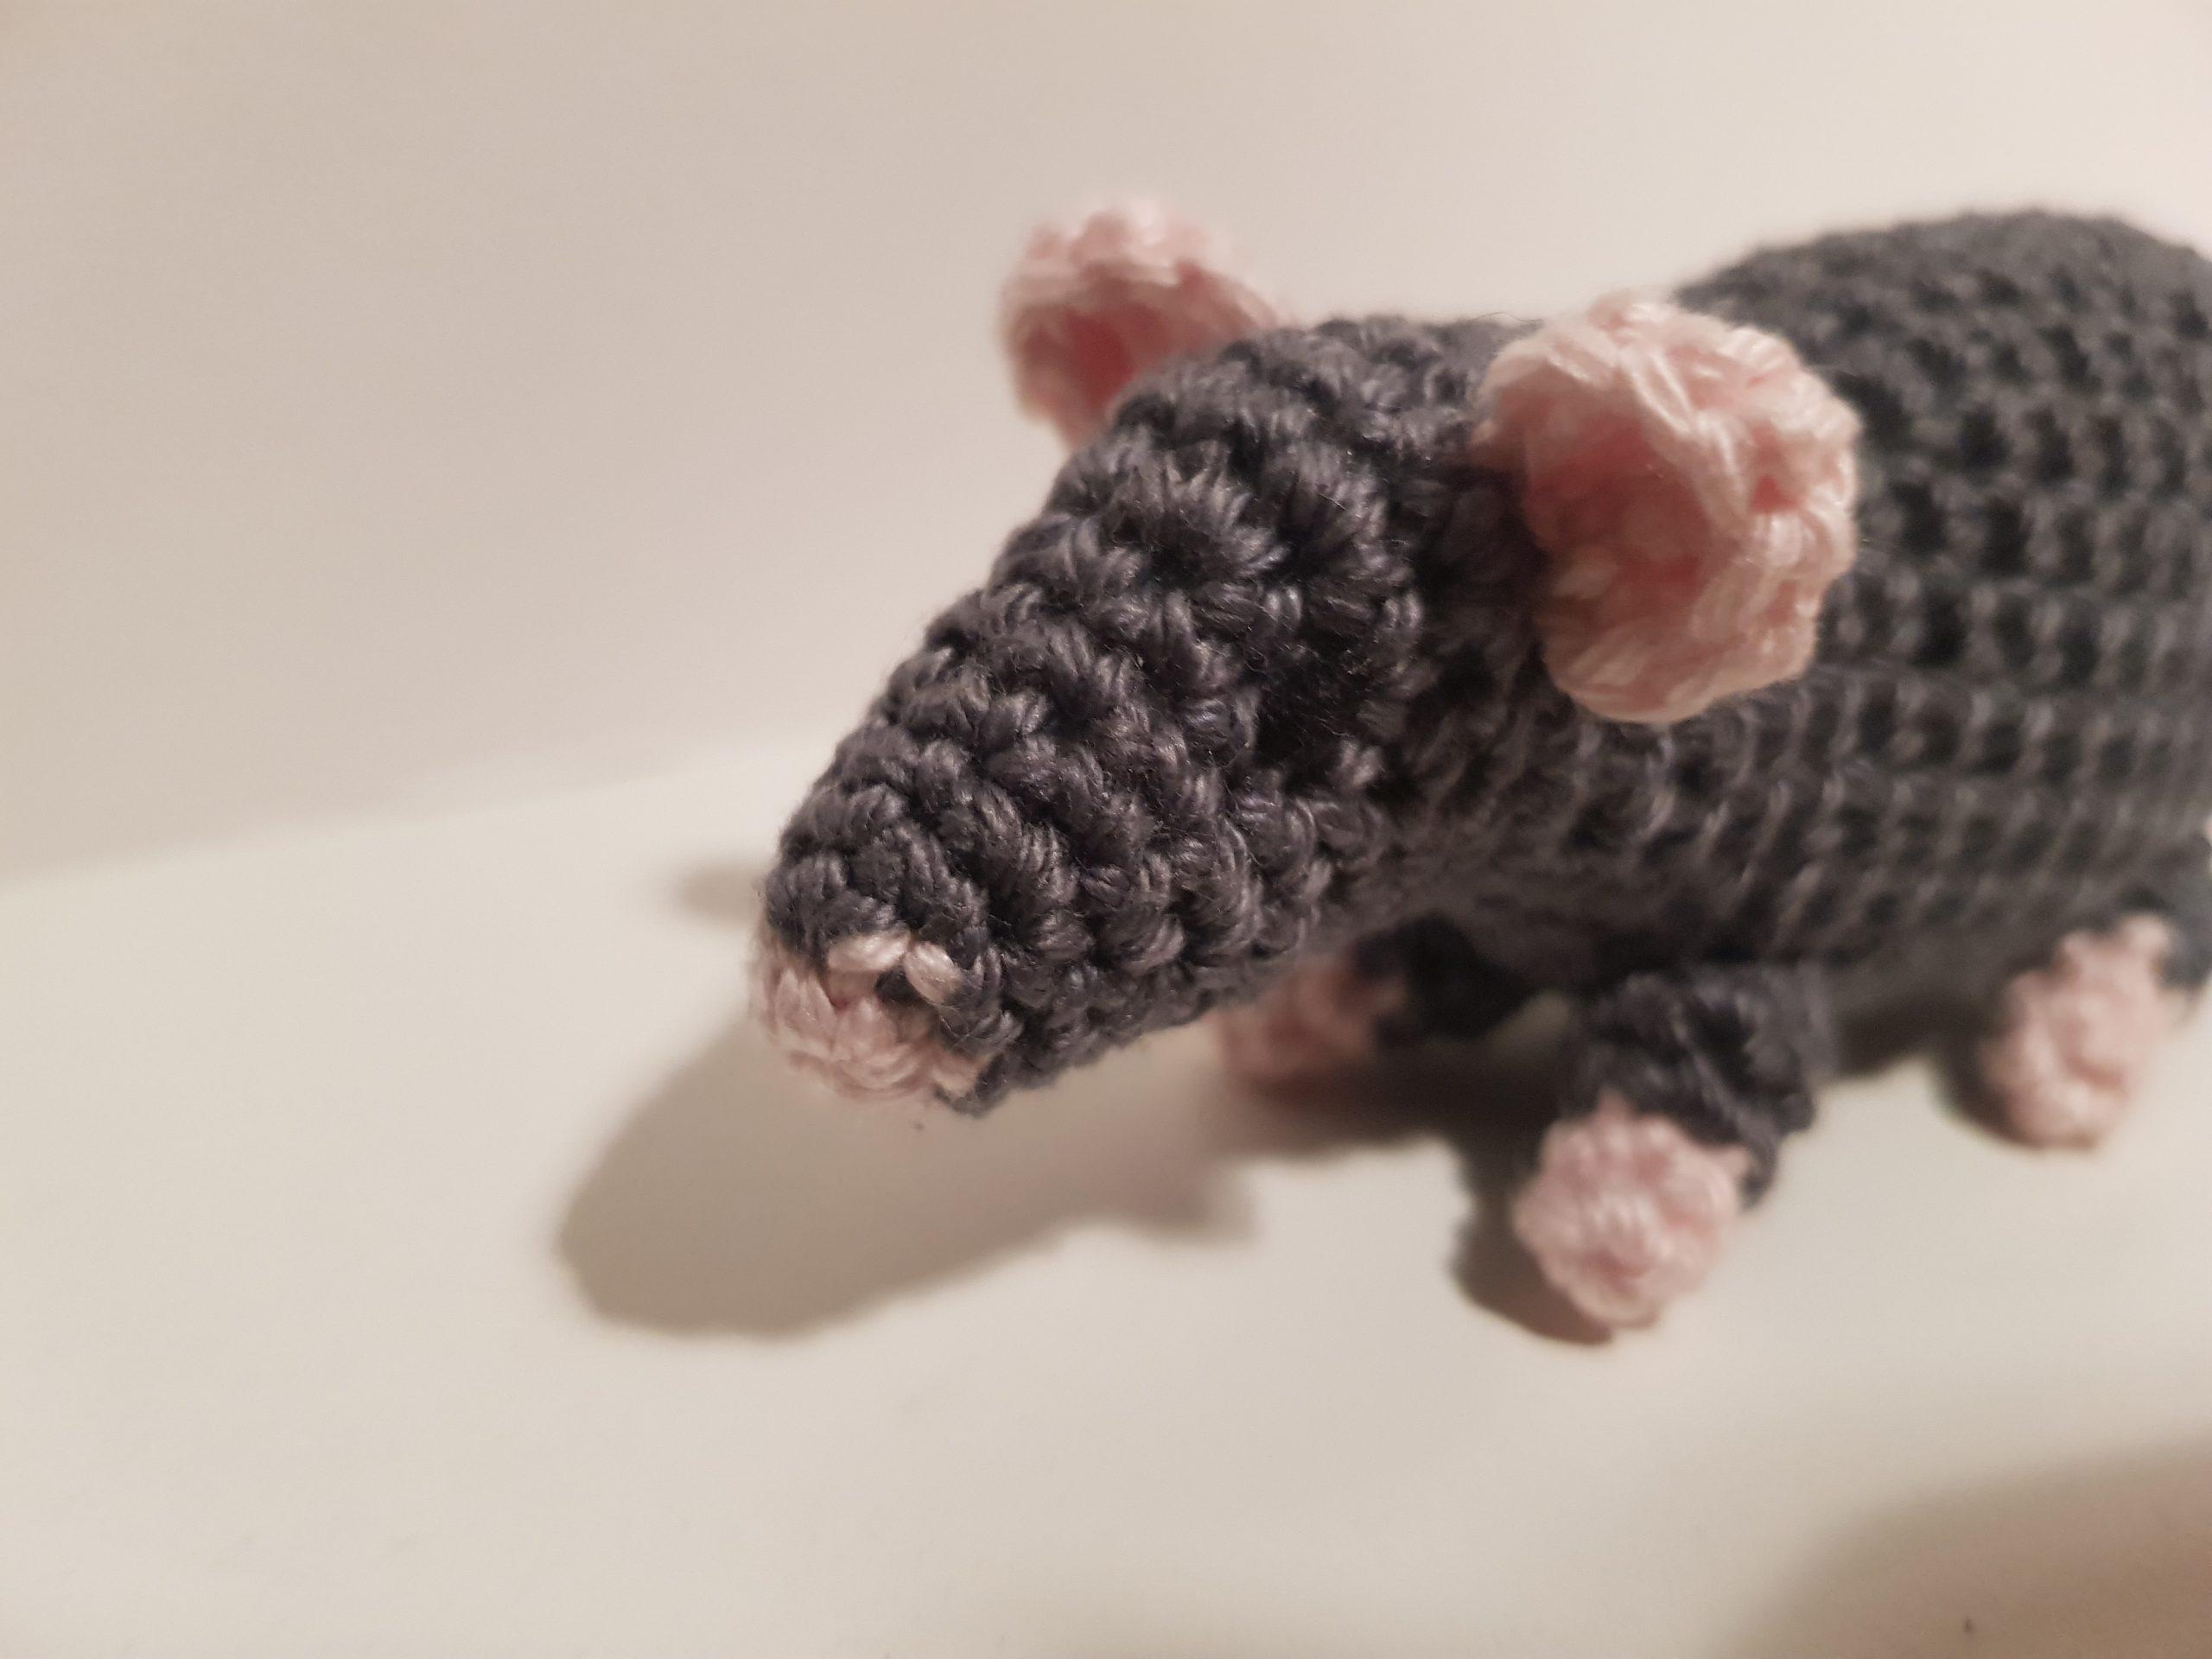 Amigurumi Crochet Rat Bookmark | Hæklemønstre, Hæklet amigurumi ... | 1920x2560